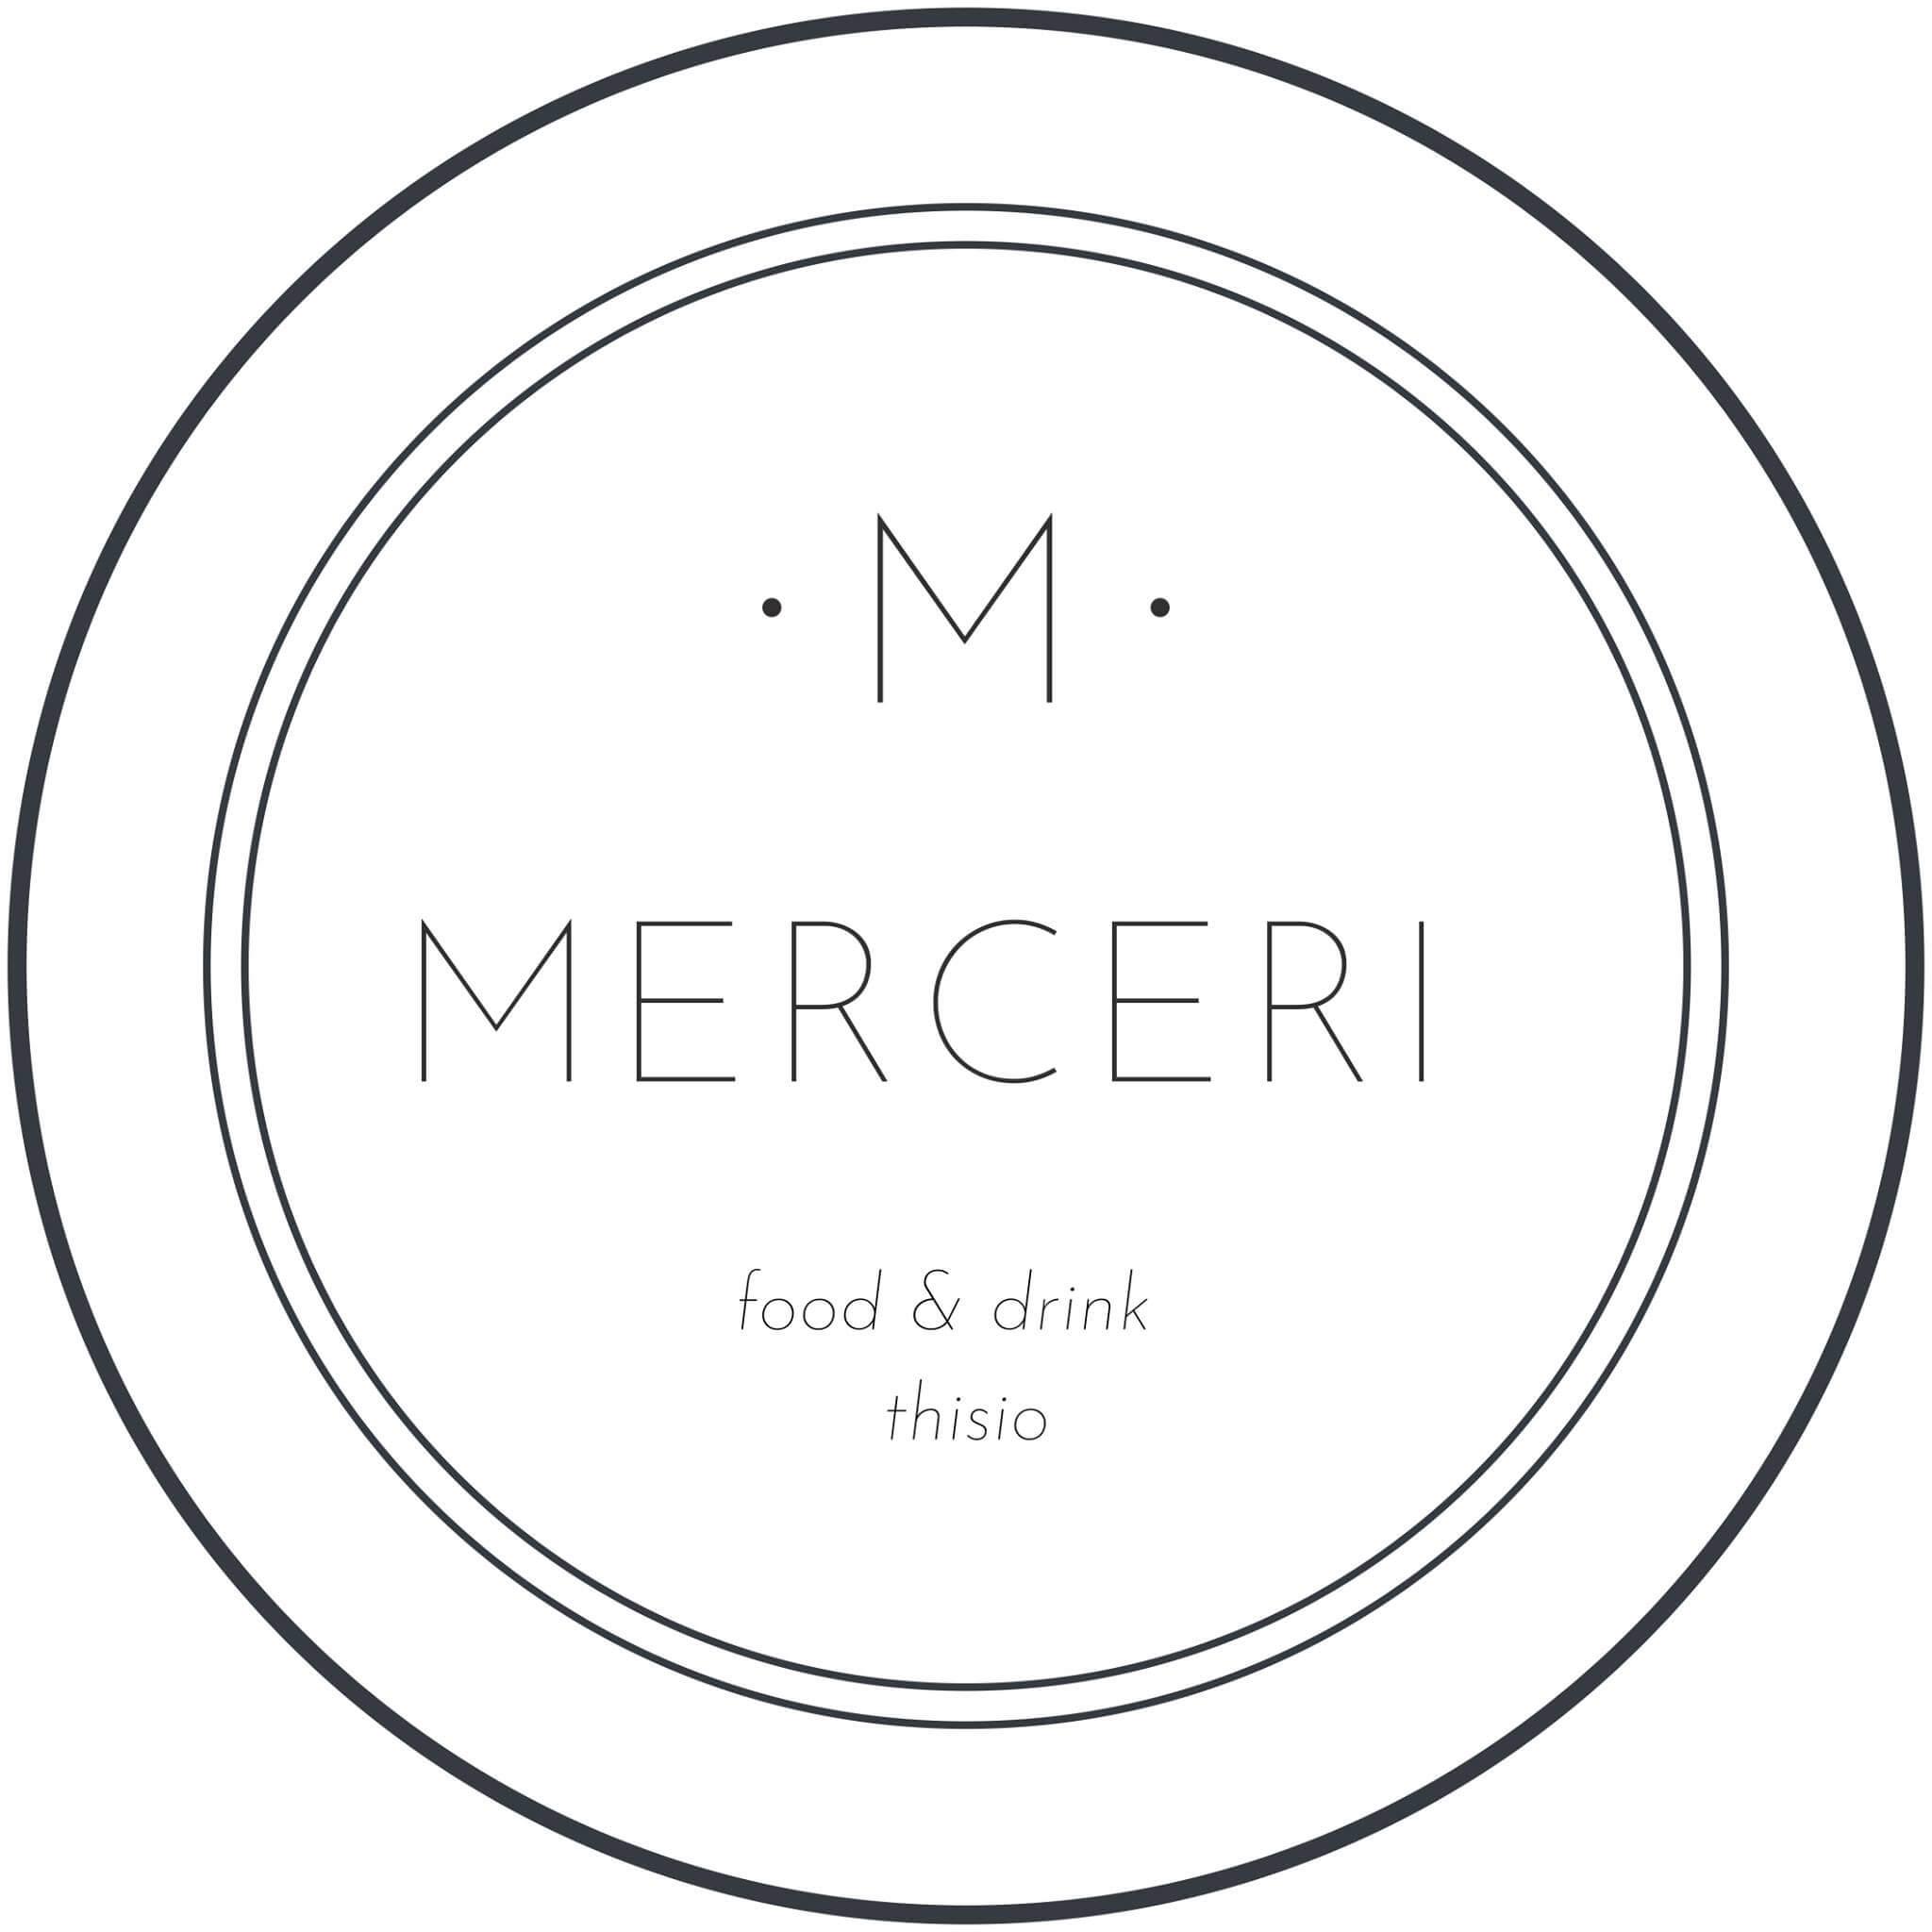 Merceri food & drink - εικόνα 2